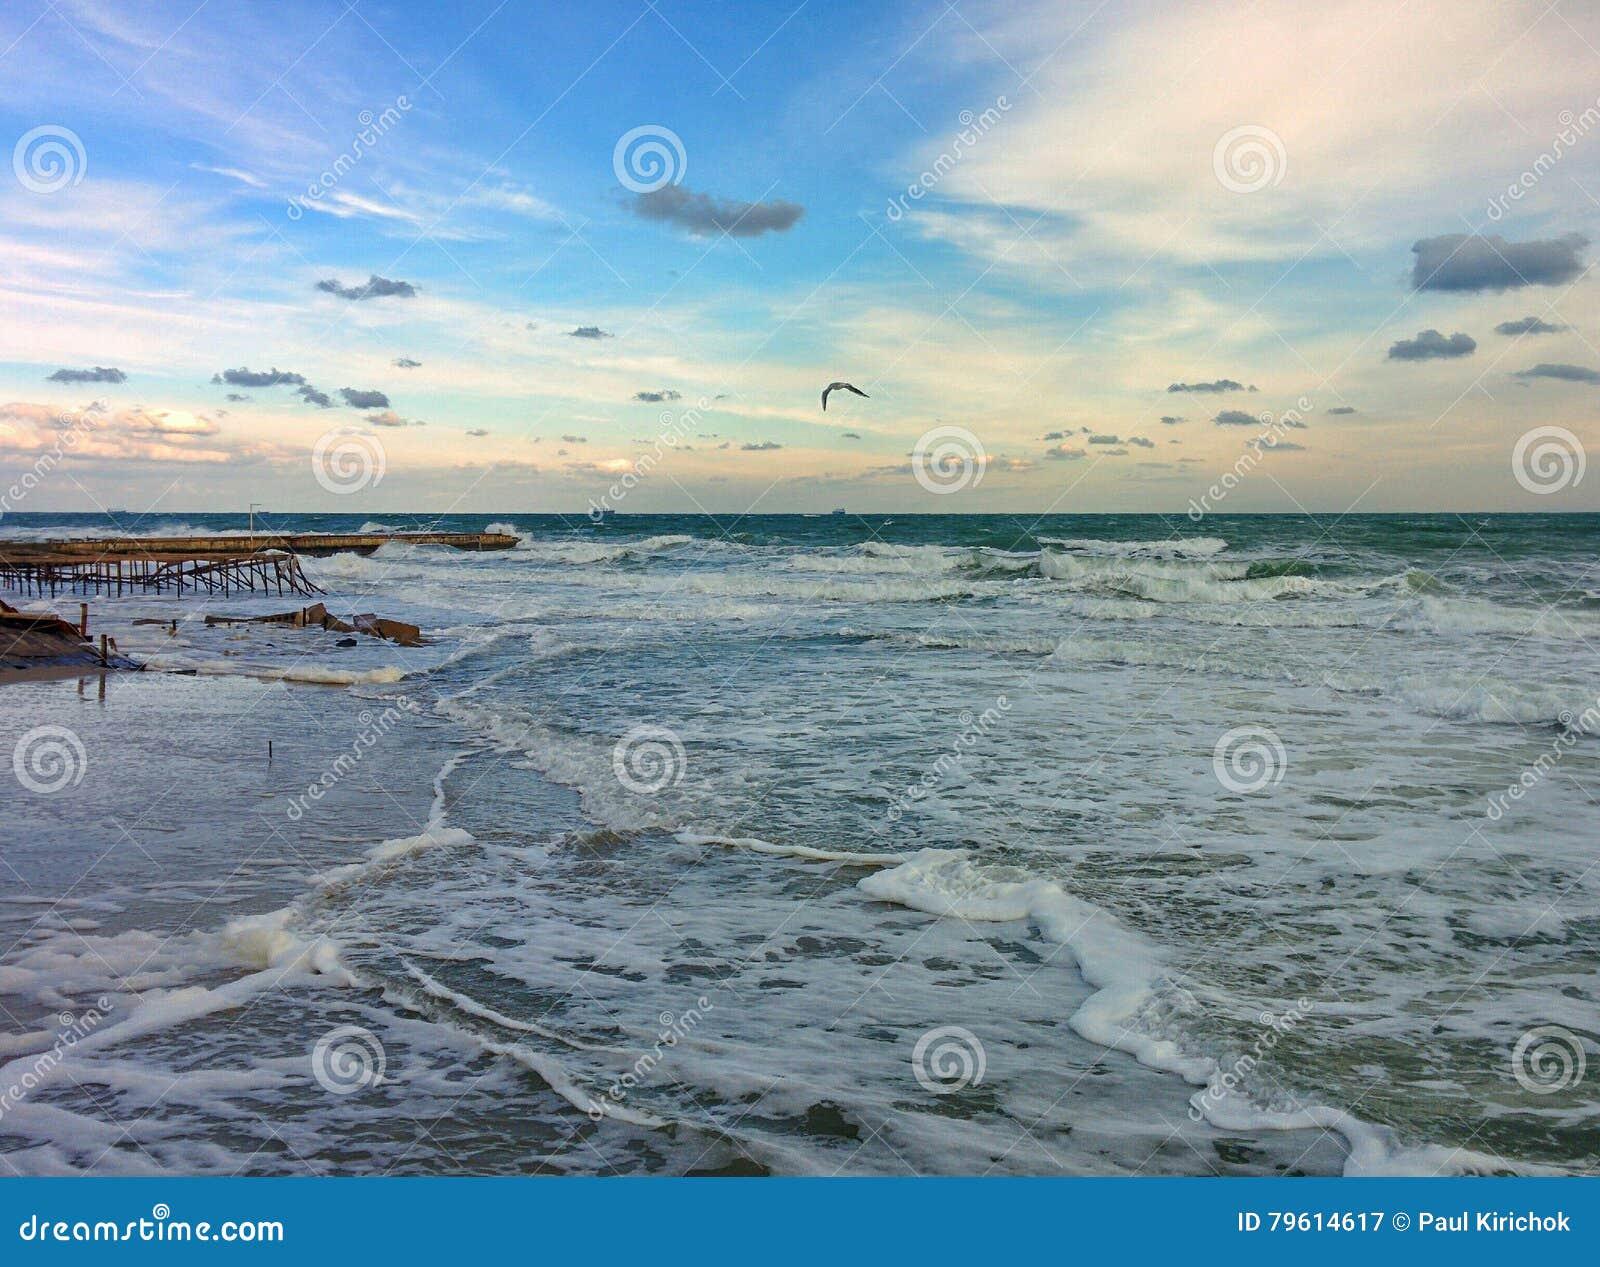 Gaivota sobre o mar raging